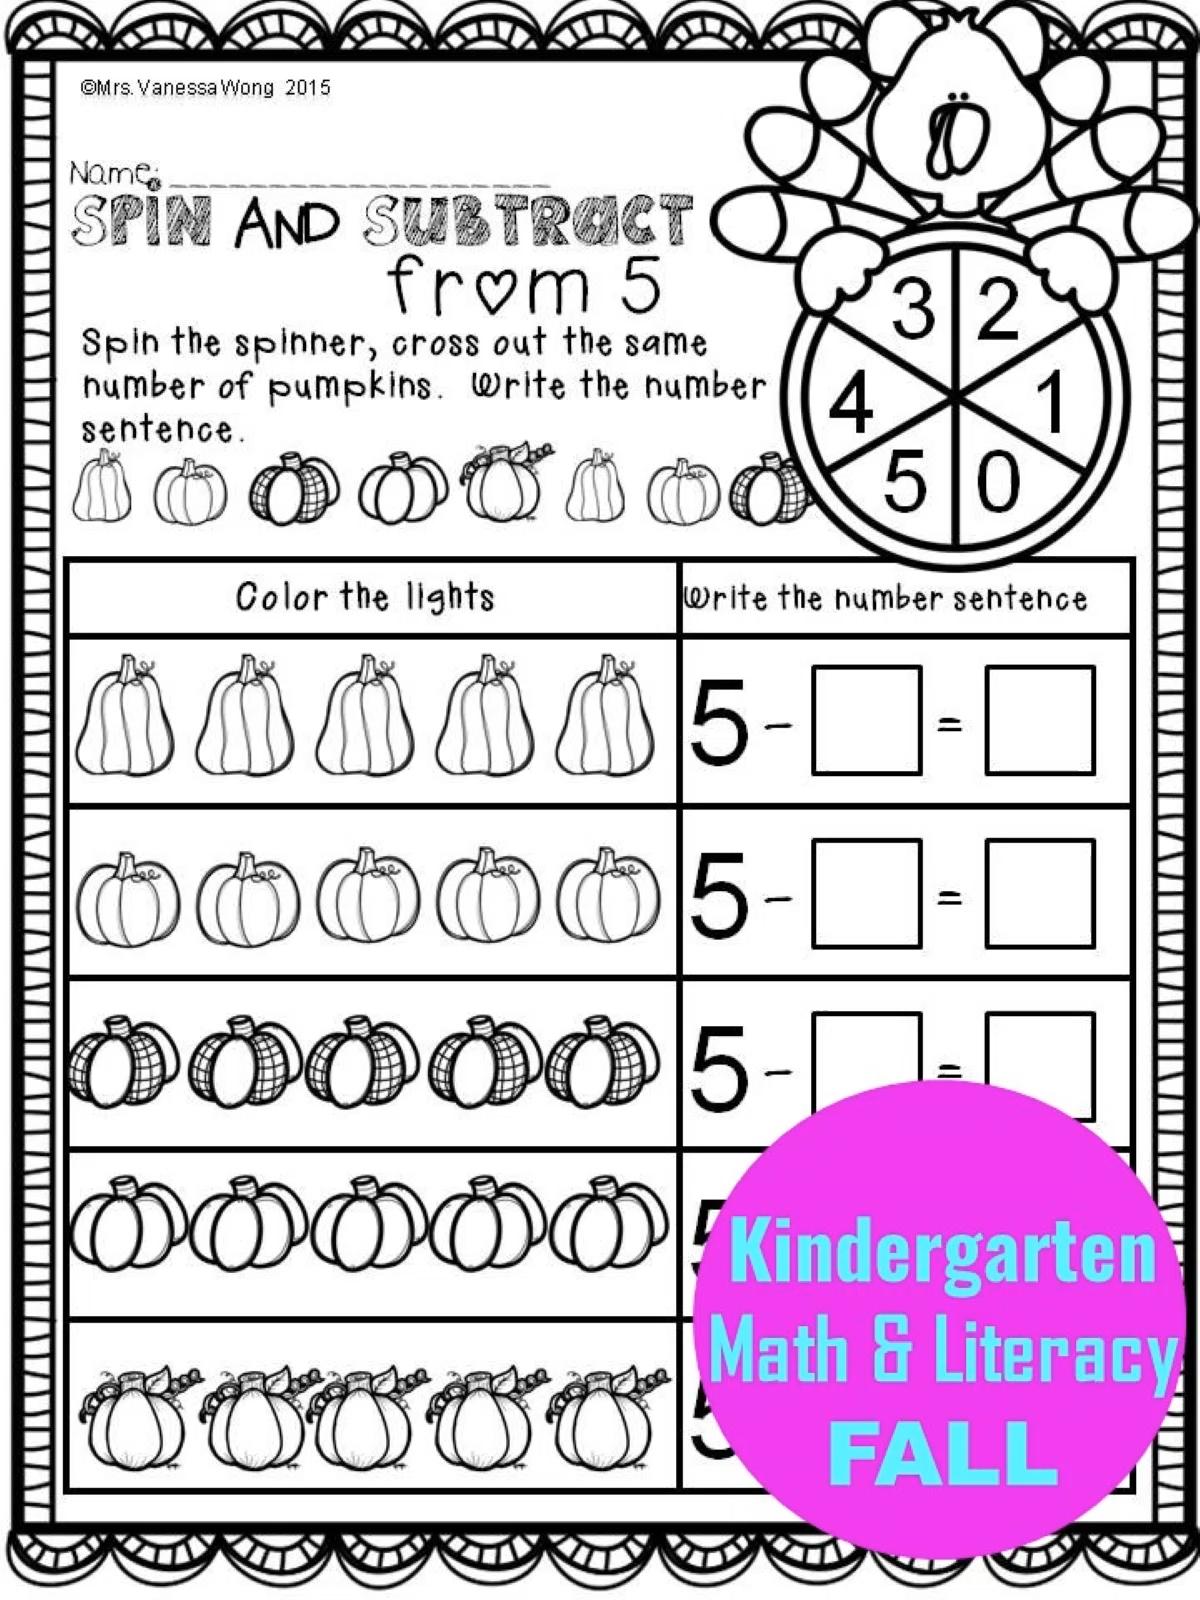 Fall Activities For Kindergarten And Homeschool Math And Literacy No Prep Printables Video Kindergarten Math First Grade Math Worksheets Kindergarten Math Activities [ 1600 x 1200 Pixel ]